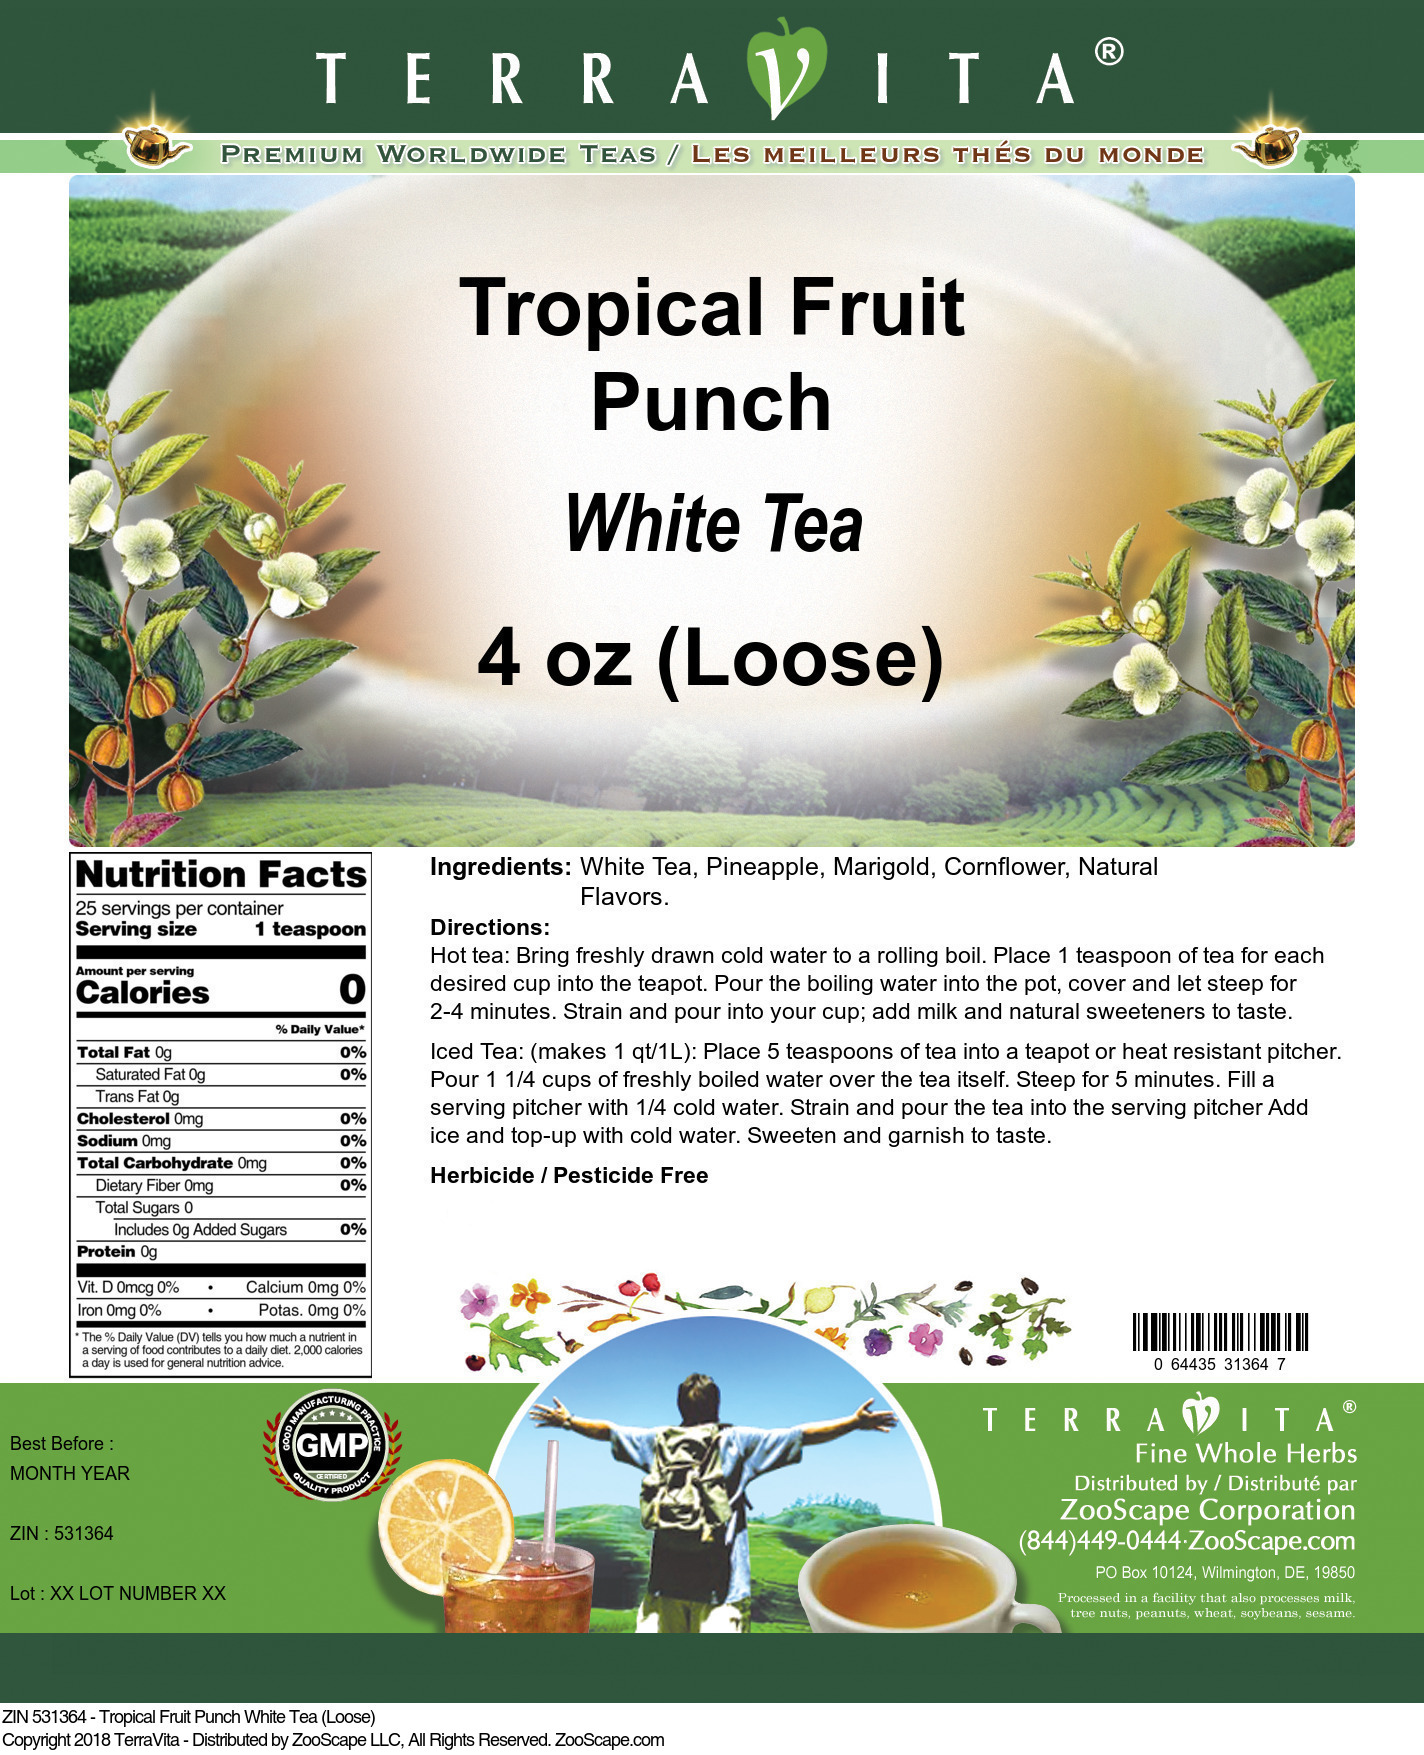 Tropical Fruit Punch White Tea